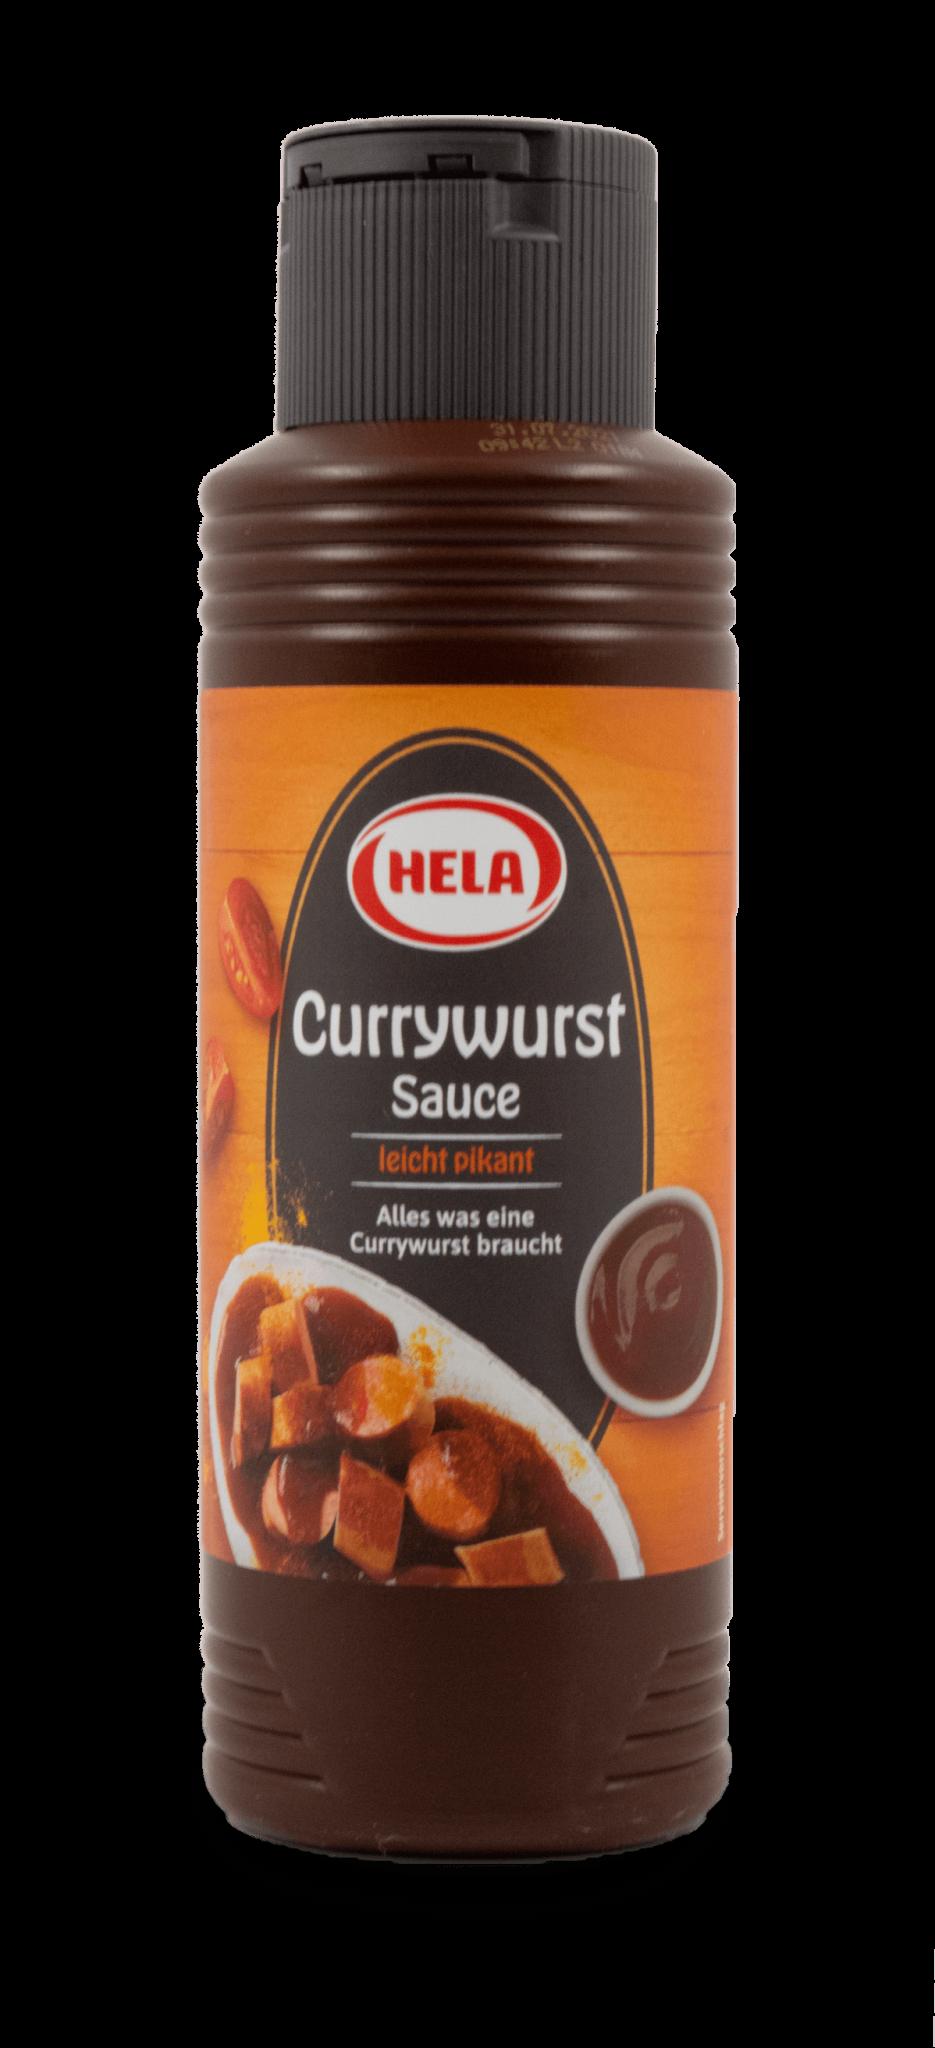 Hela Curry Wurst Sauce